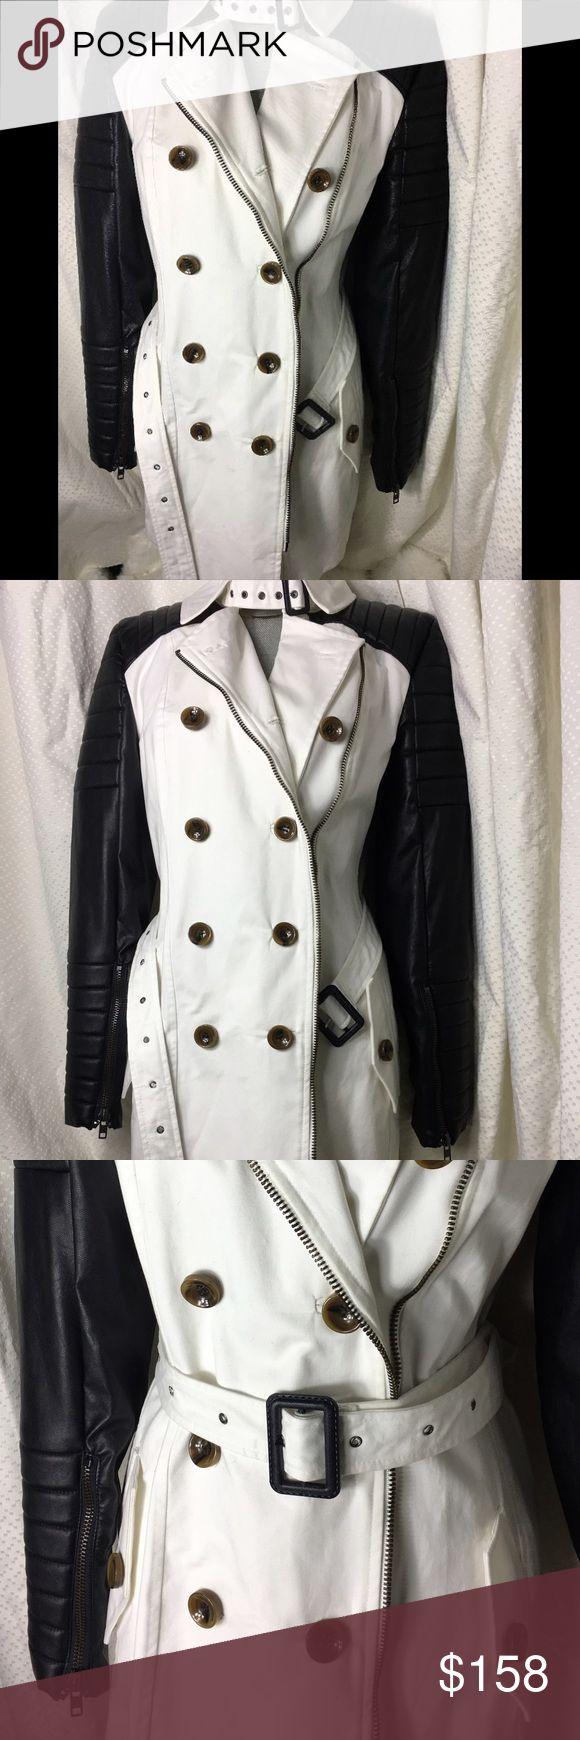 Rad black and white trench coat Gorgeous white coat Jackets & Coats Trench Coats